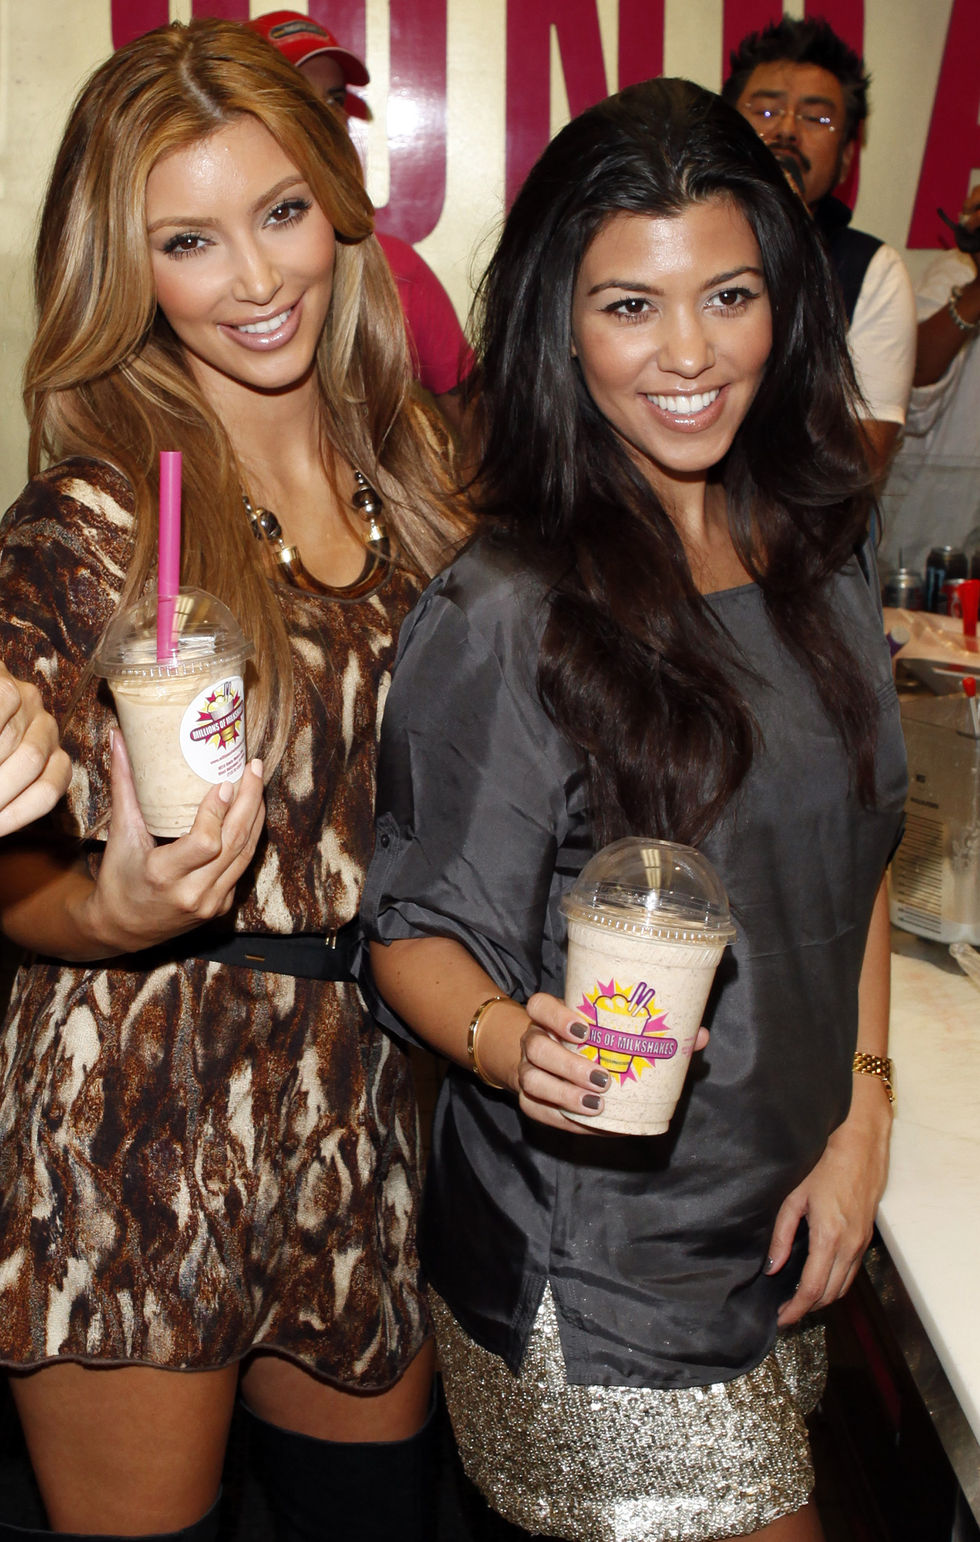 kim-and-kourtney-kardashian-at-millions-of-milkshakes-in-los-angeles-04